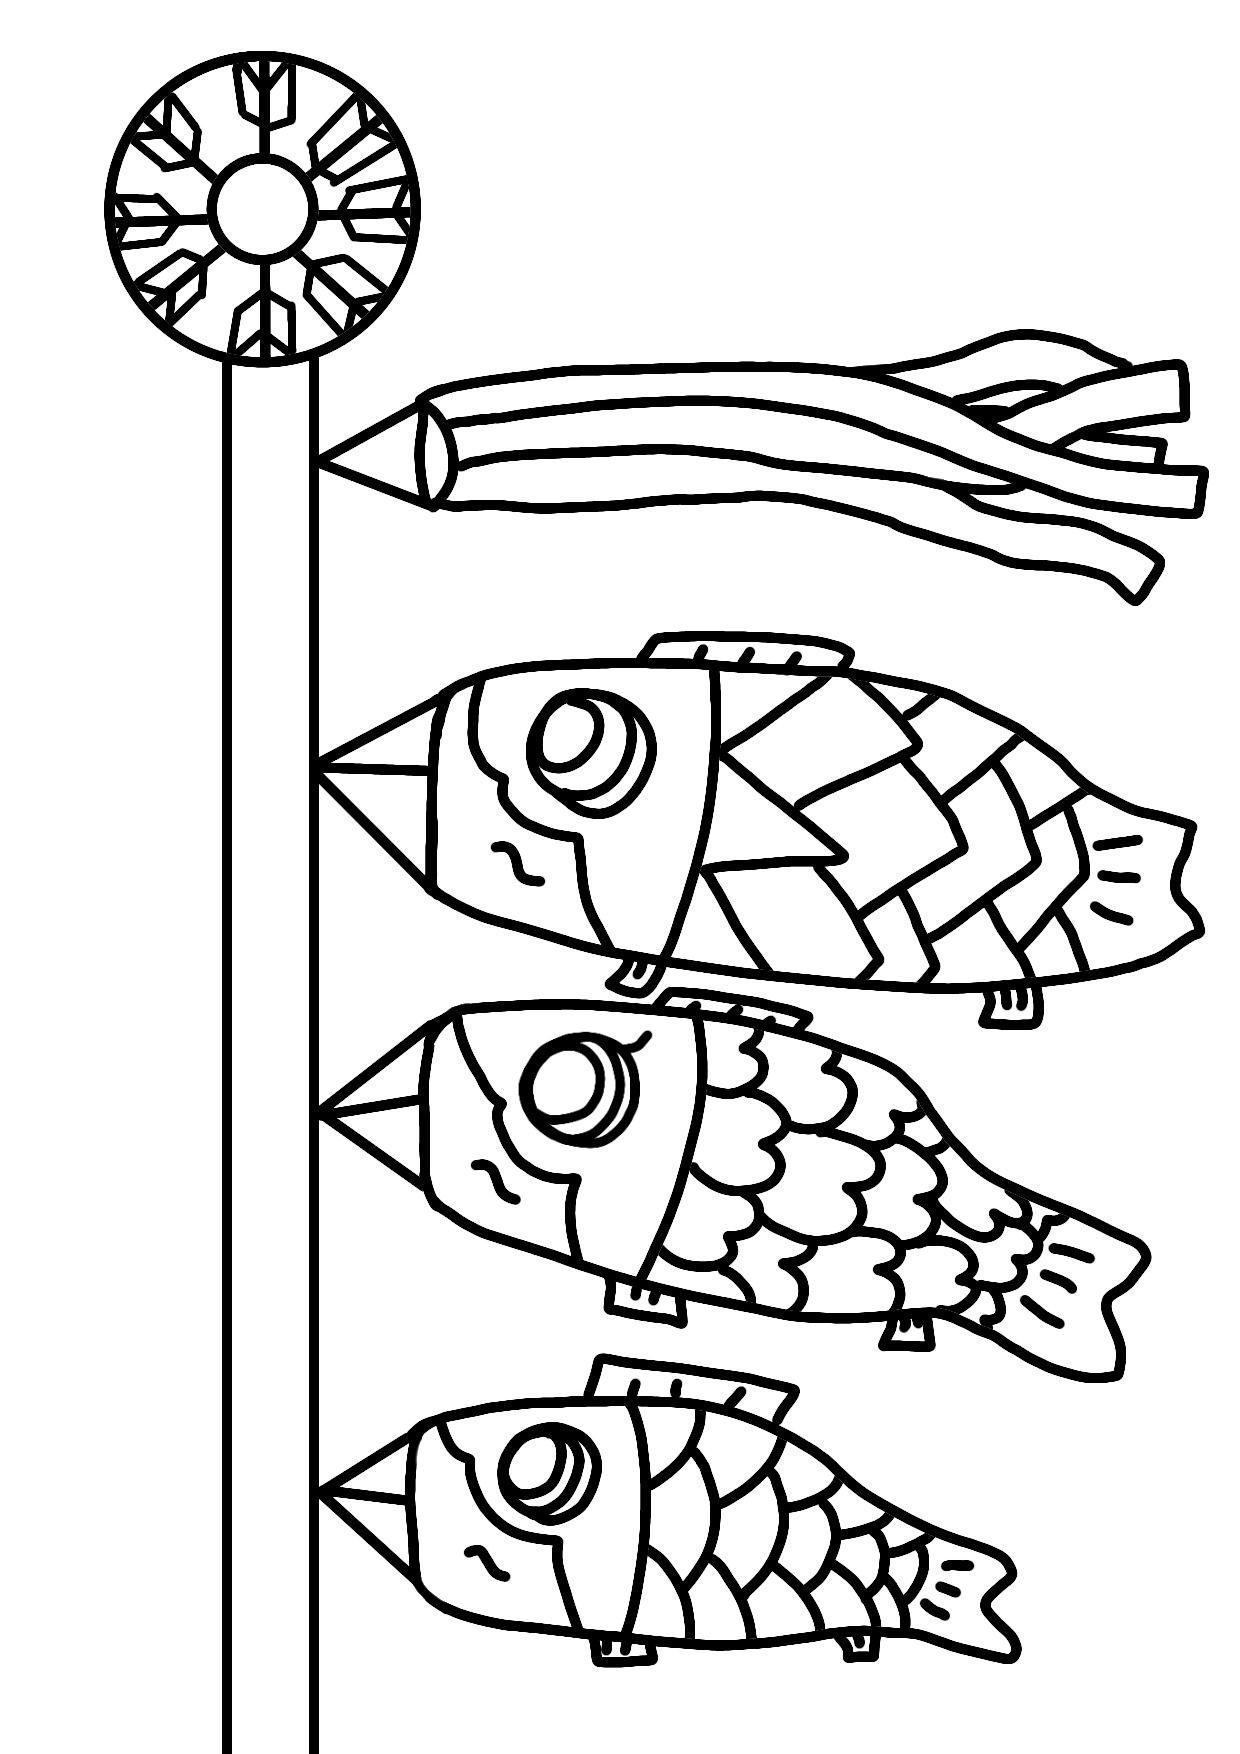 Kids Nurie ベスト 5 月 イラスト 塗り絵 イラスト 塗り絵 塗り絵 鯉のぼり イラスト